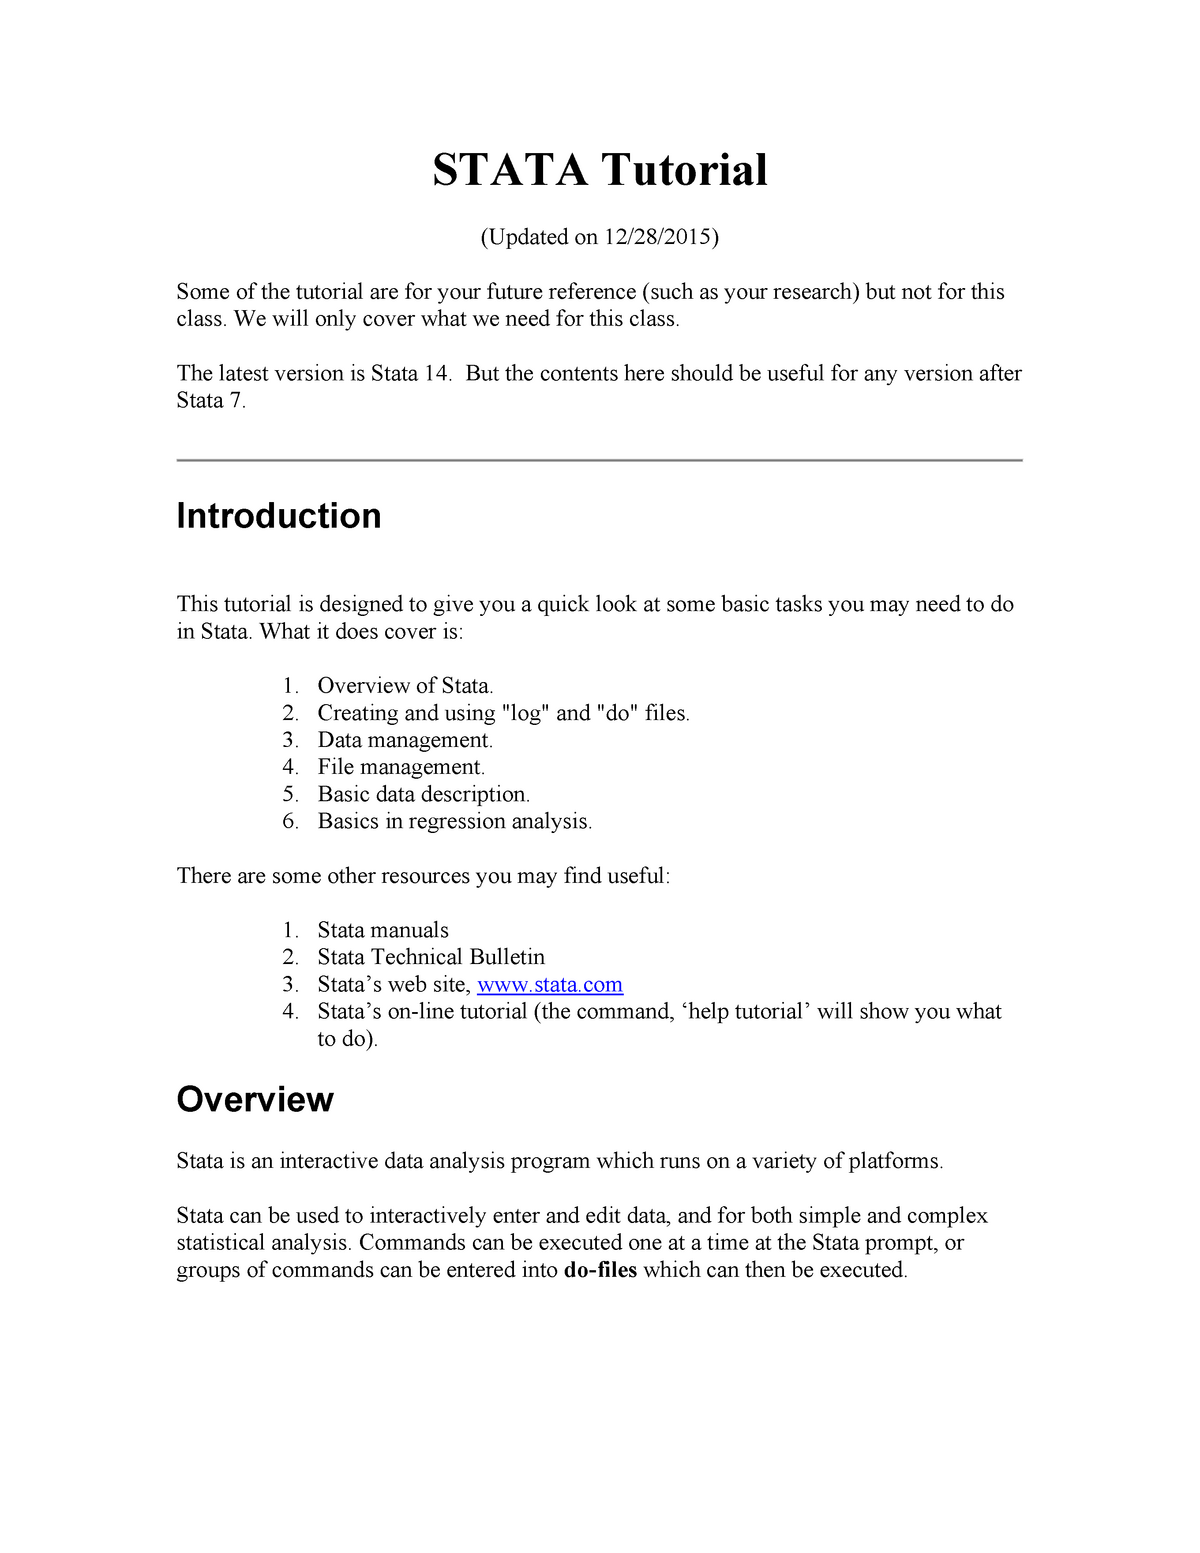 Stata tutorial - ECON 4355: Econometrics - StuDocu